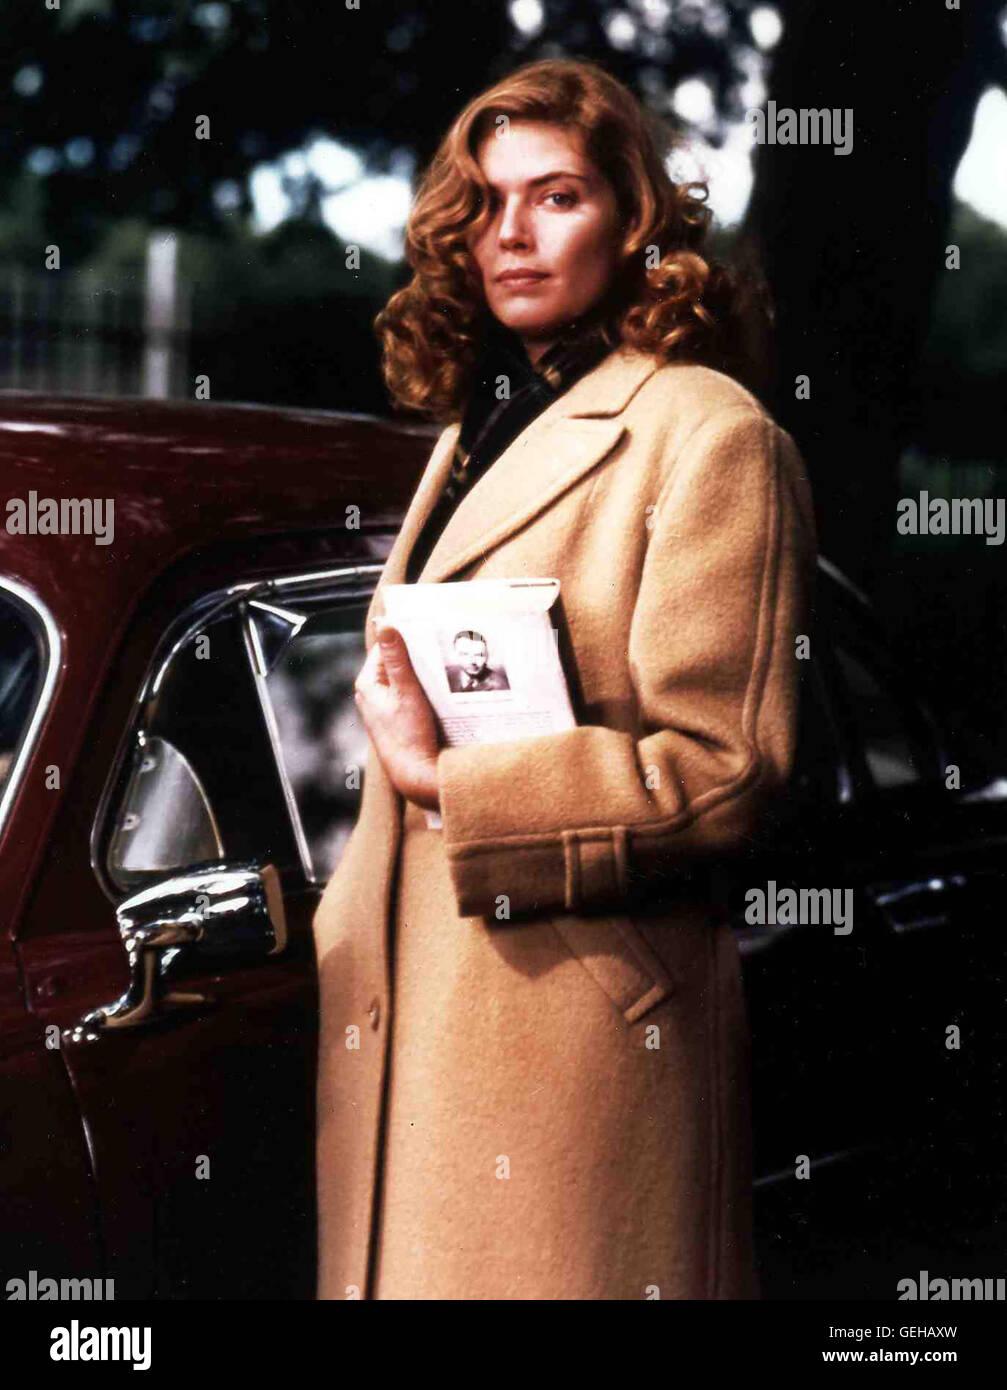 Kelly McGillis Als Emily Crane (Kelly McGillis) sich weigert, vor McCarthy's Ausschuss die Namen liberaler Buergerrechtler - Stock Image